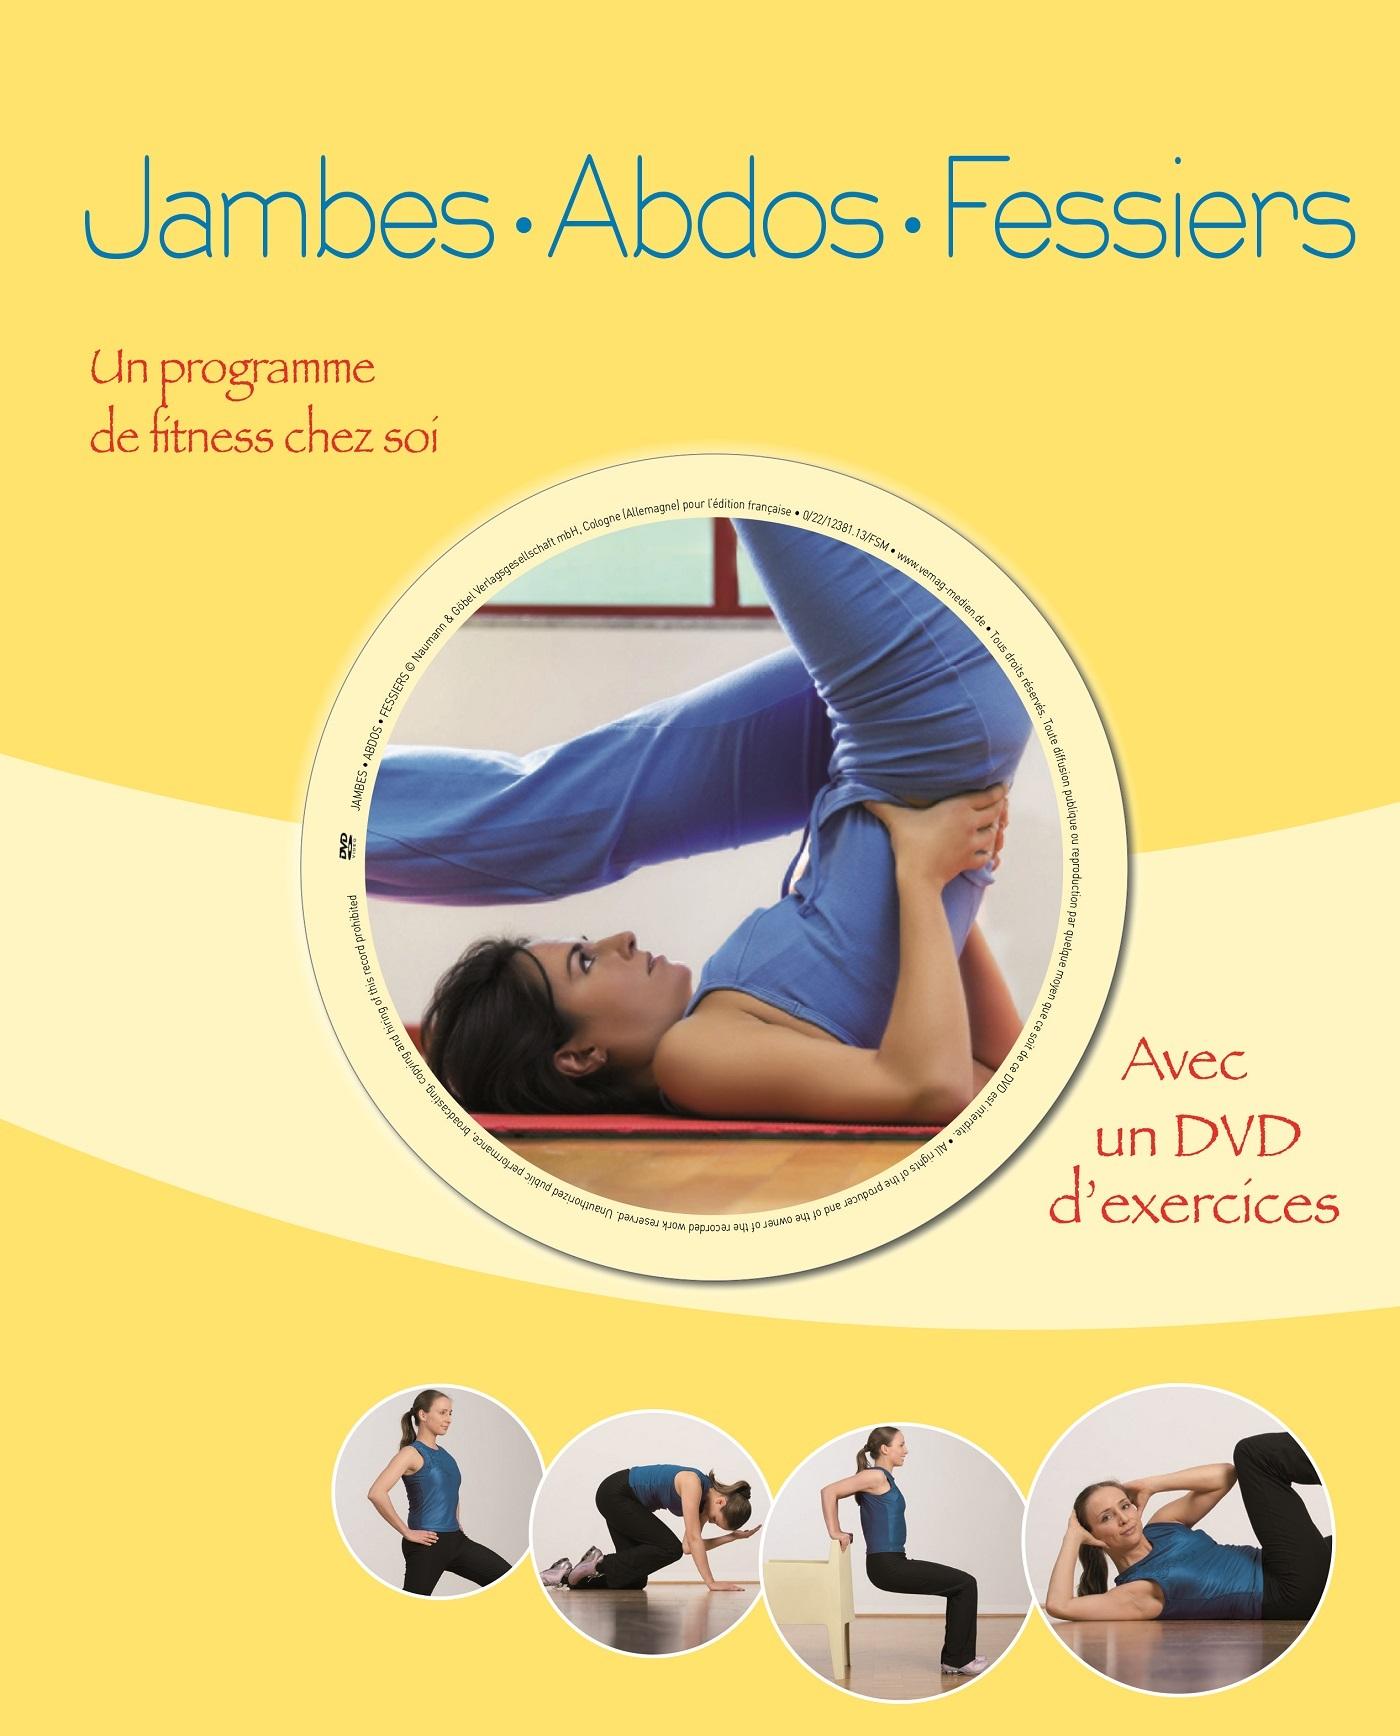 JAMBES ABDOS FESSIERS